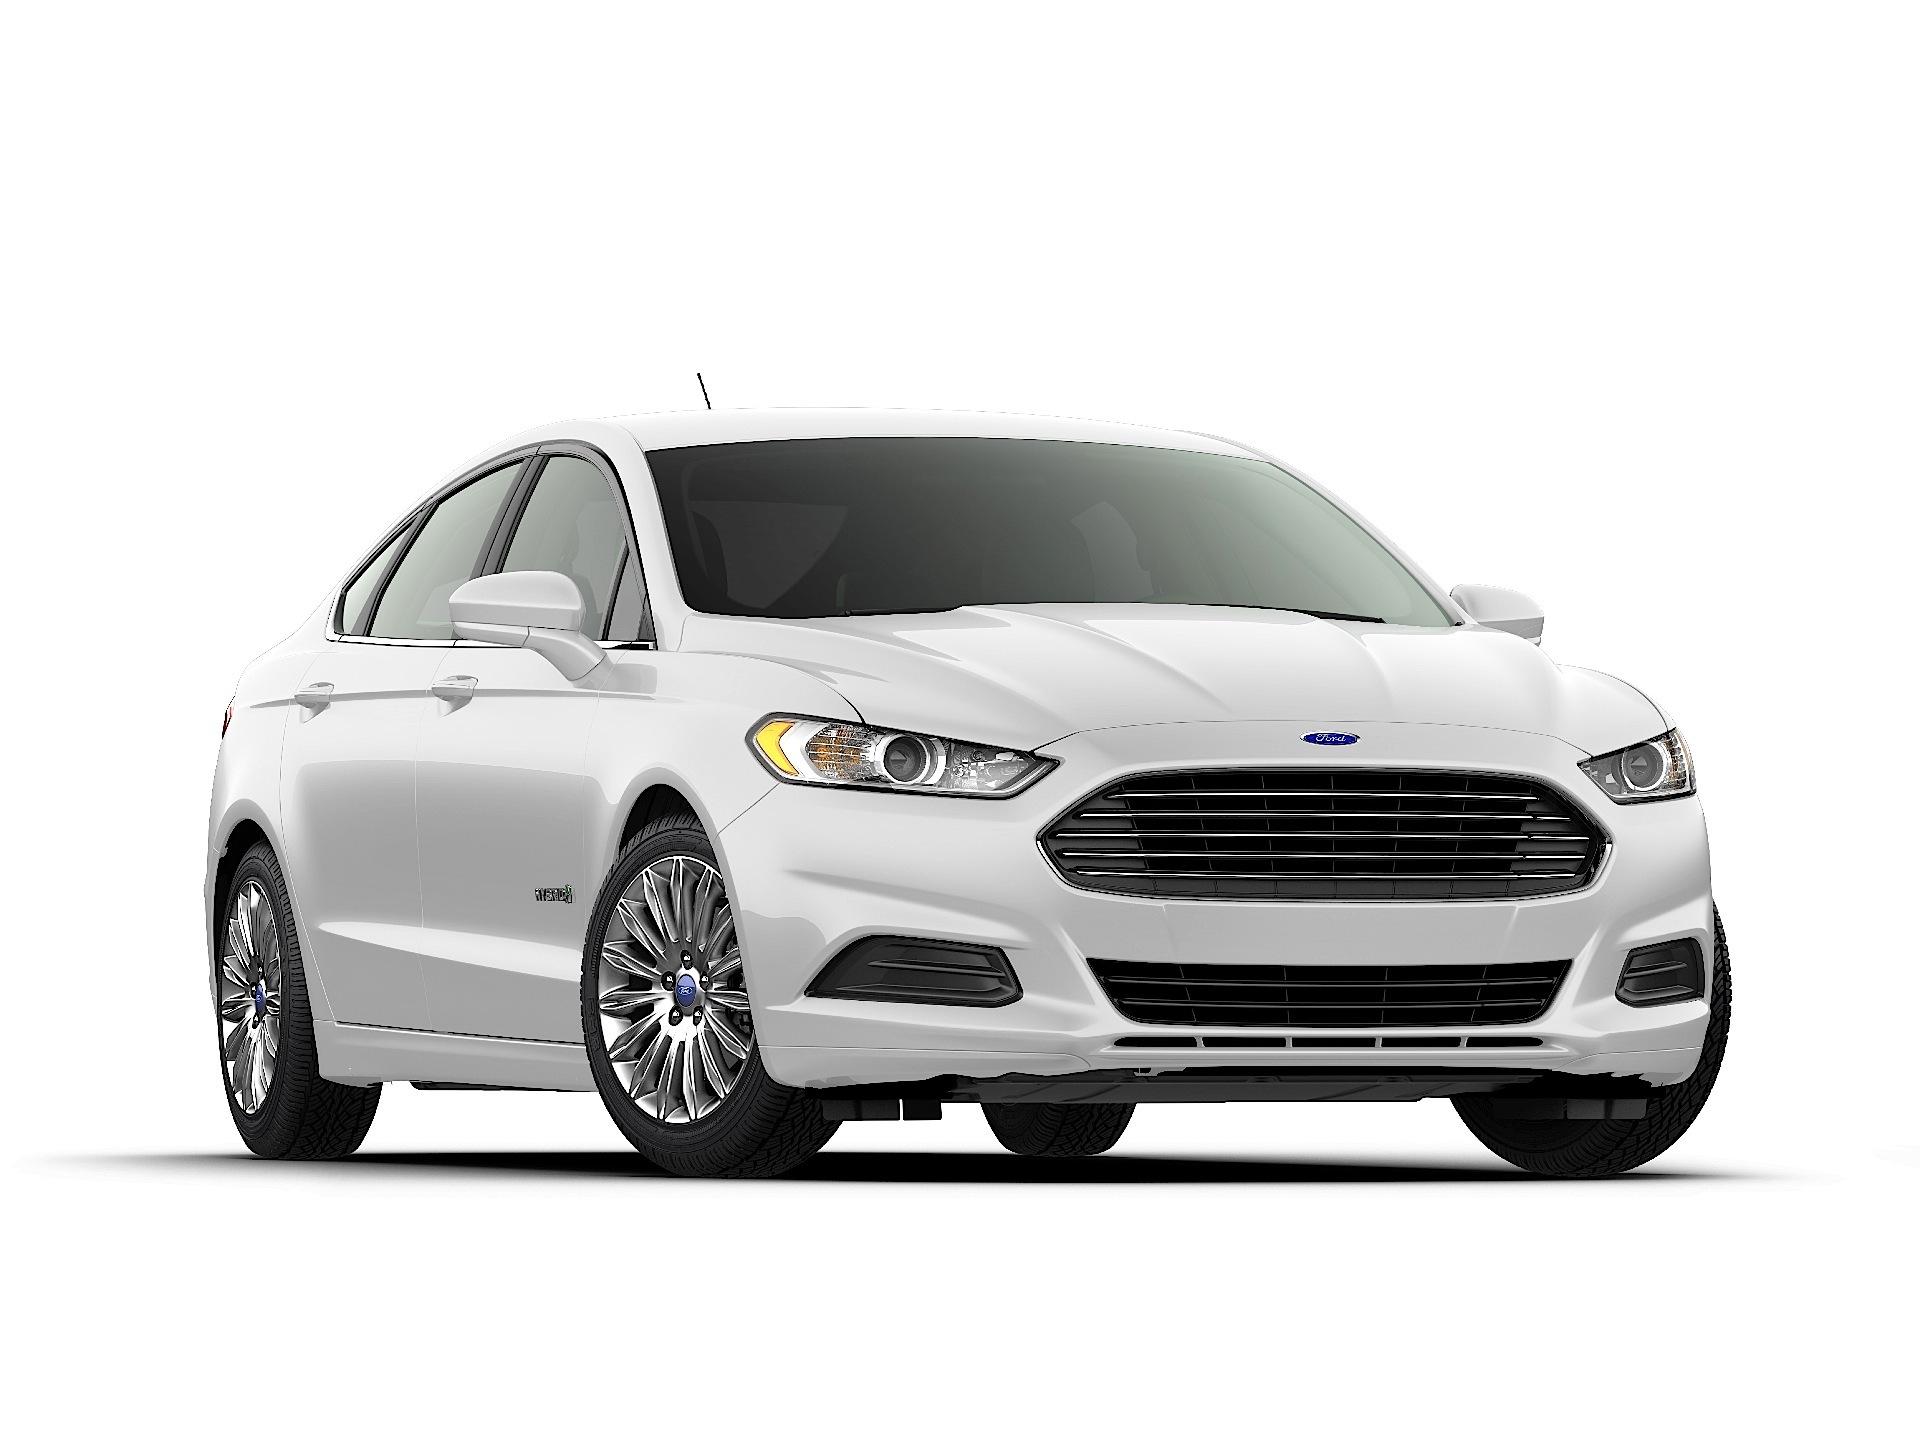 fusion ford cars american fleet north passenger se sedan brown list tyler hybrid junk titanium quarter engine tx ecoboost forecast